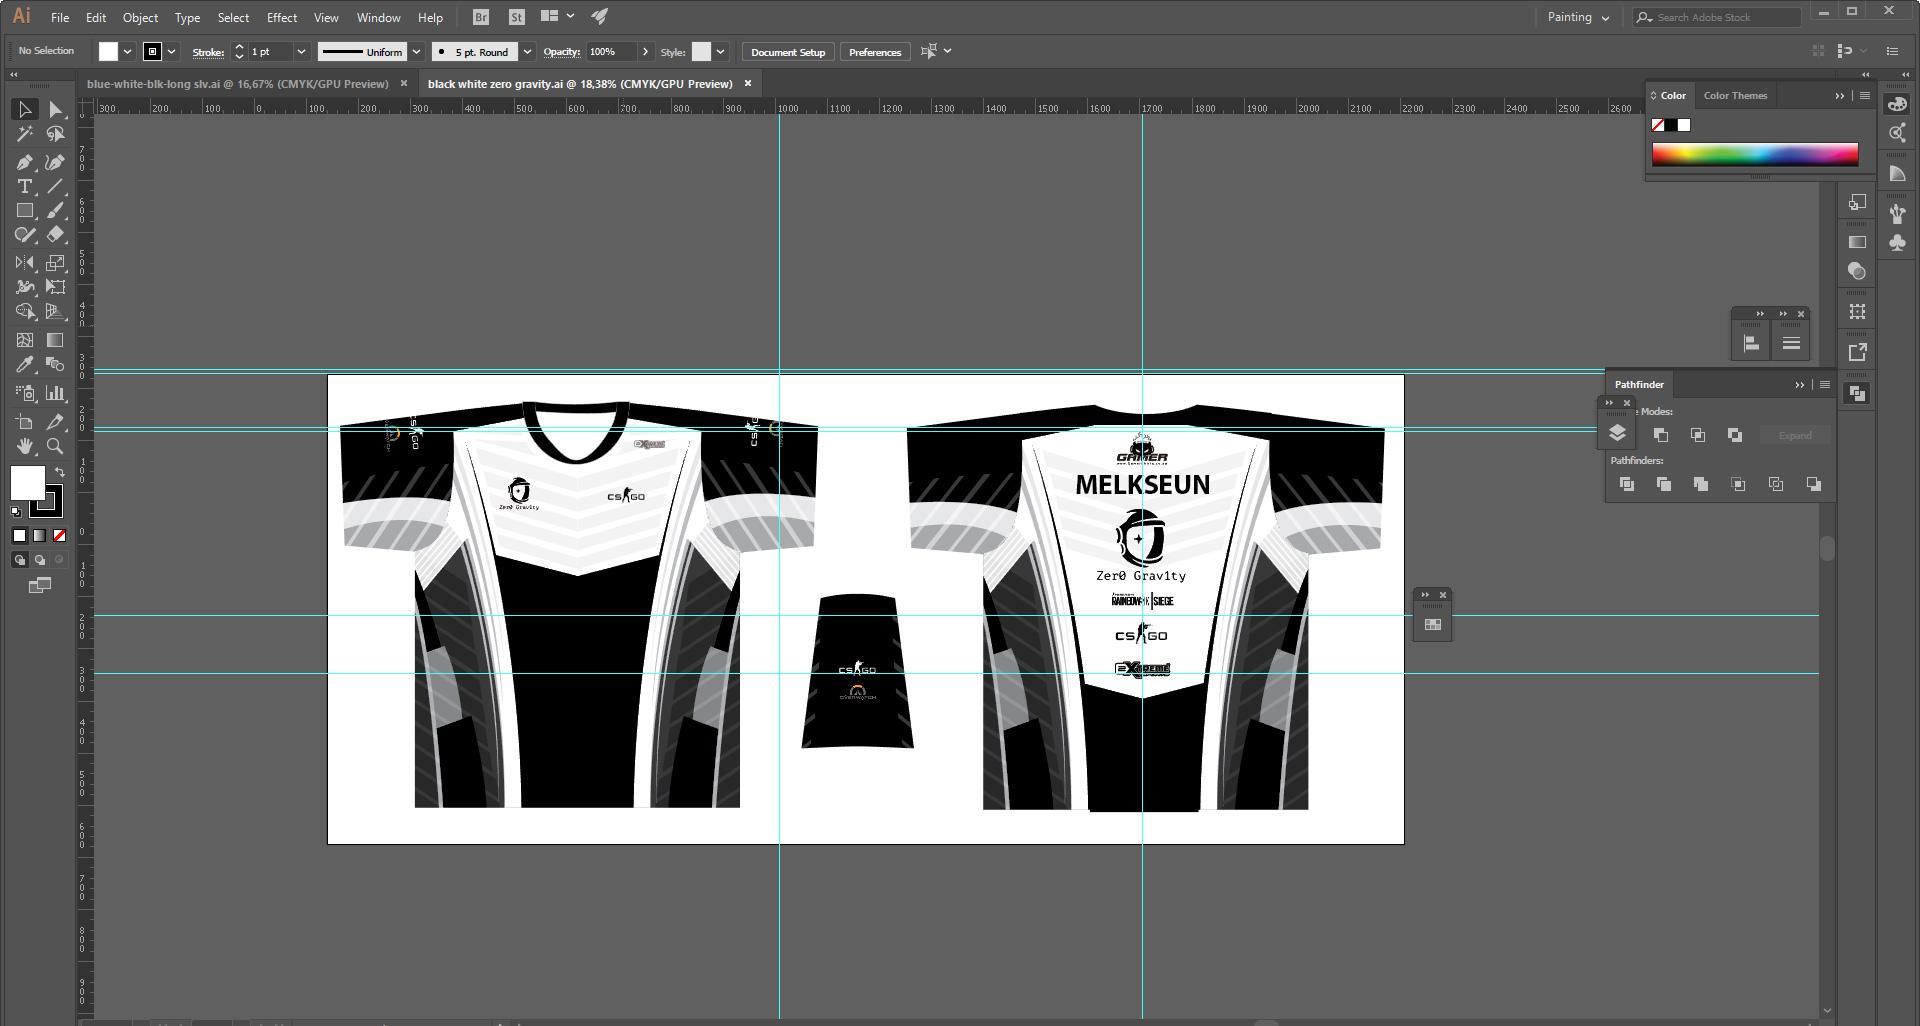 gamer-shirt-black-and-white-template-design 20